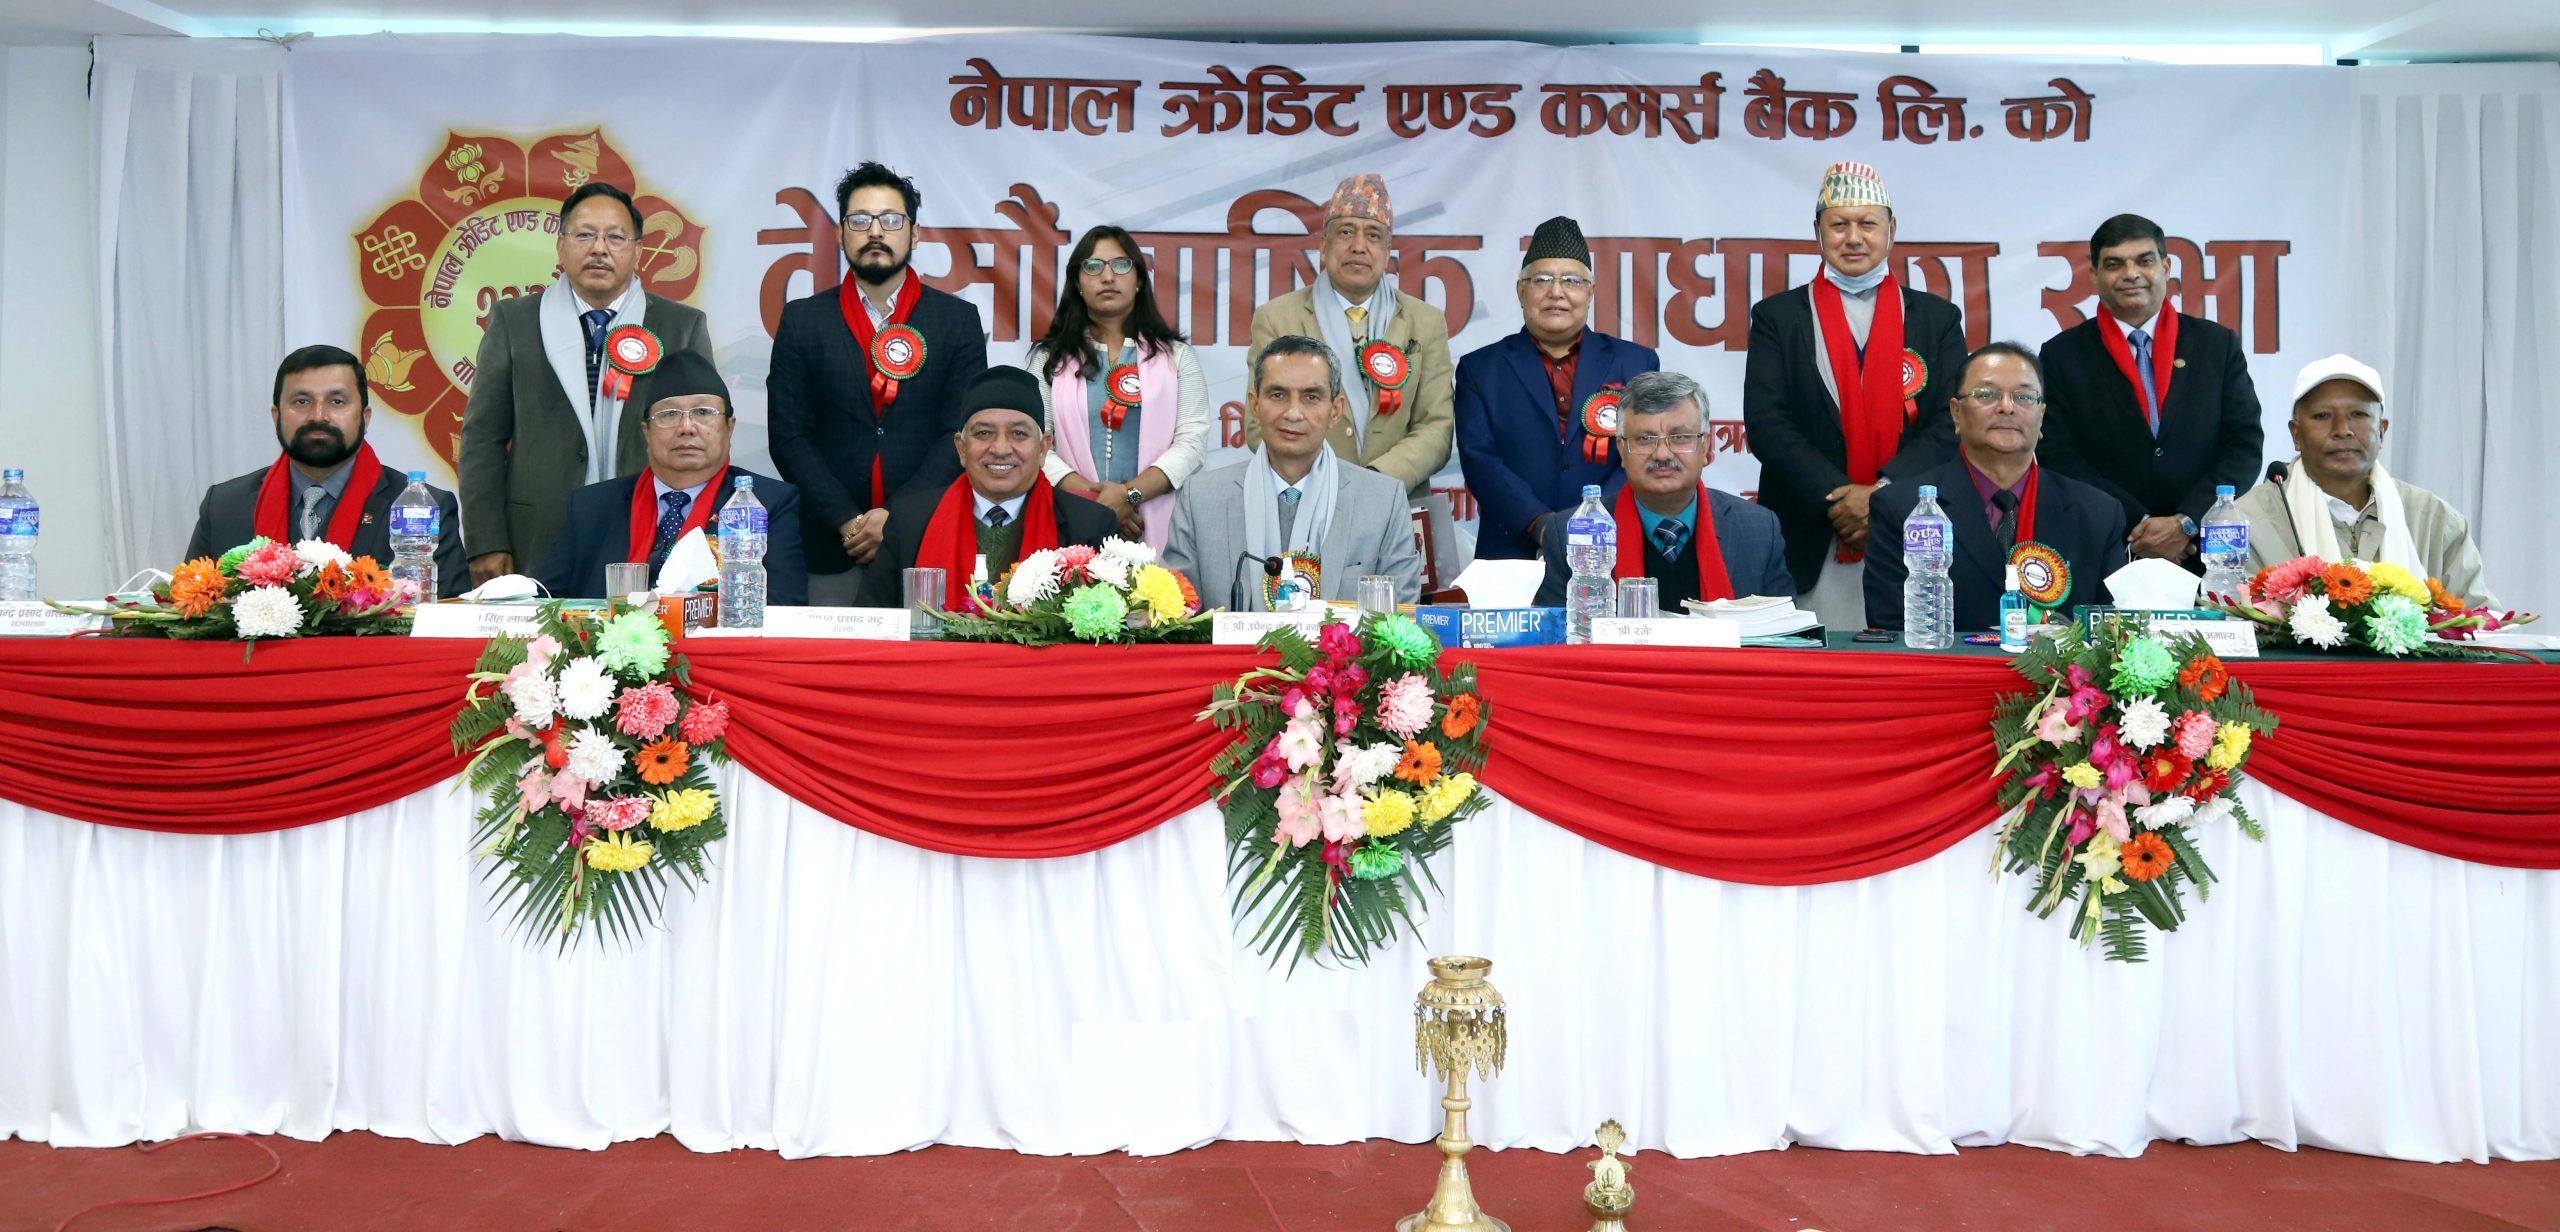 नेपाल क्रेडिट एण्ड कमर्स बैंक लिमिटेडको वार्षिक साधारणसभा सम्पन्न